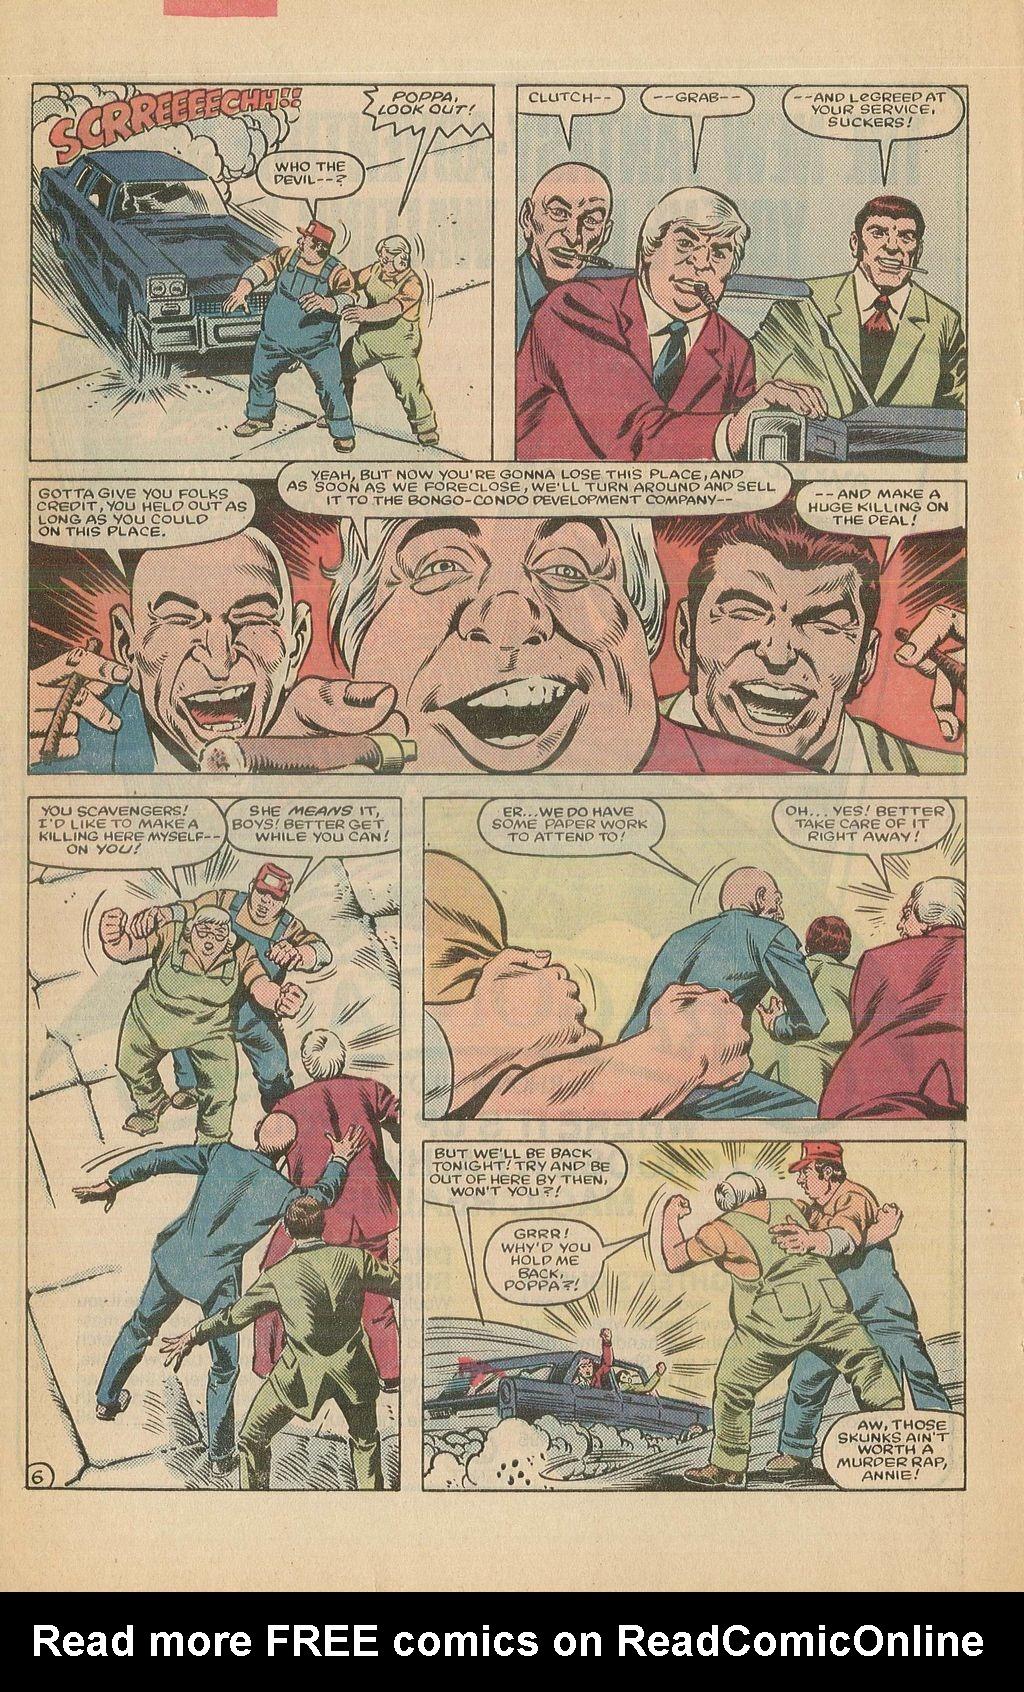 Read online U.S. 1 comic -  Issue #12 - 10